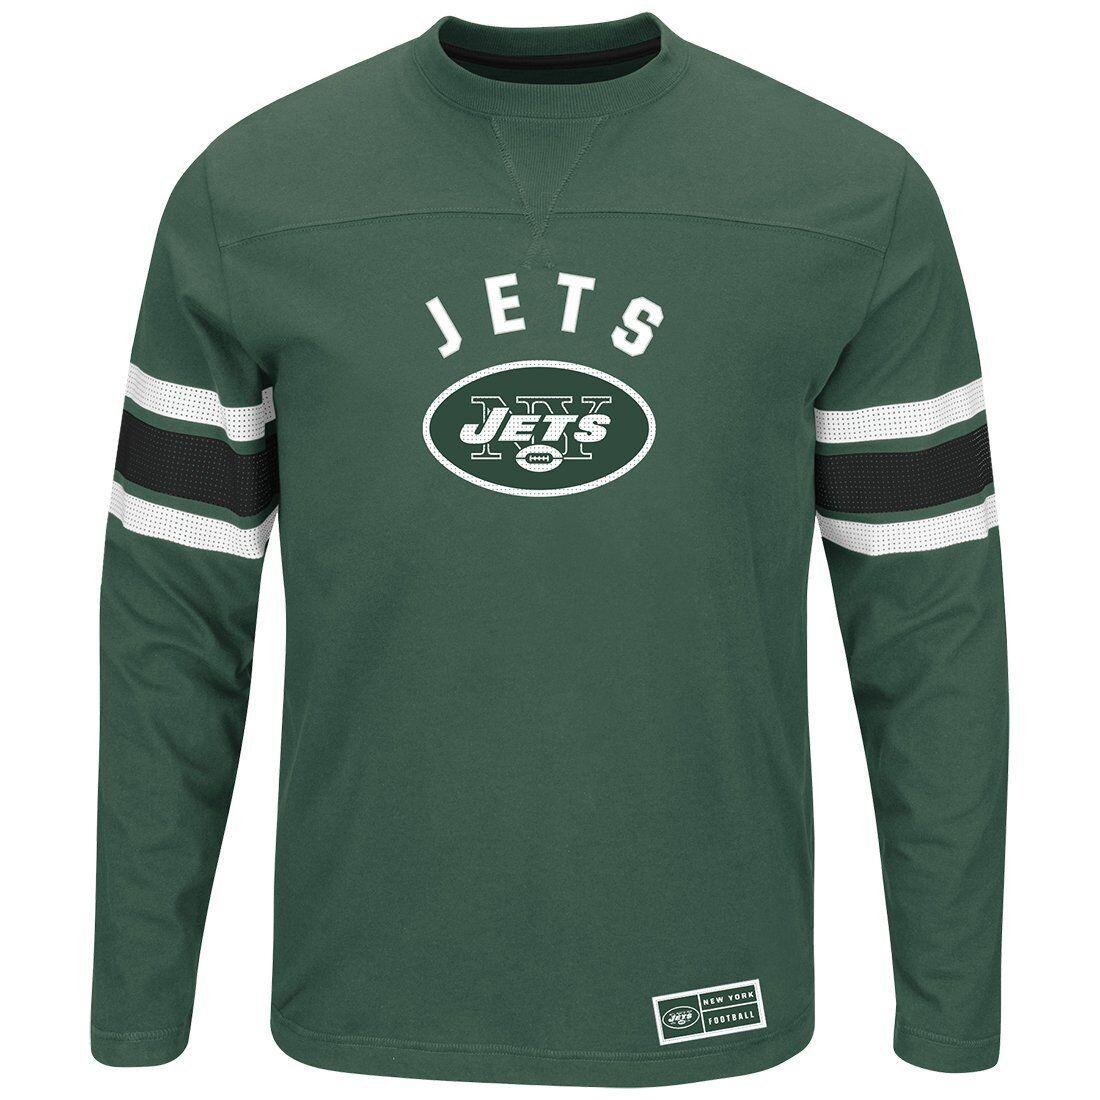 NFL Football Langarm Langarm Langarm Shirt NEW YORK N.Y. JETS Long sleeve Power Hit Longsleeve d27a69